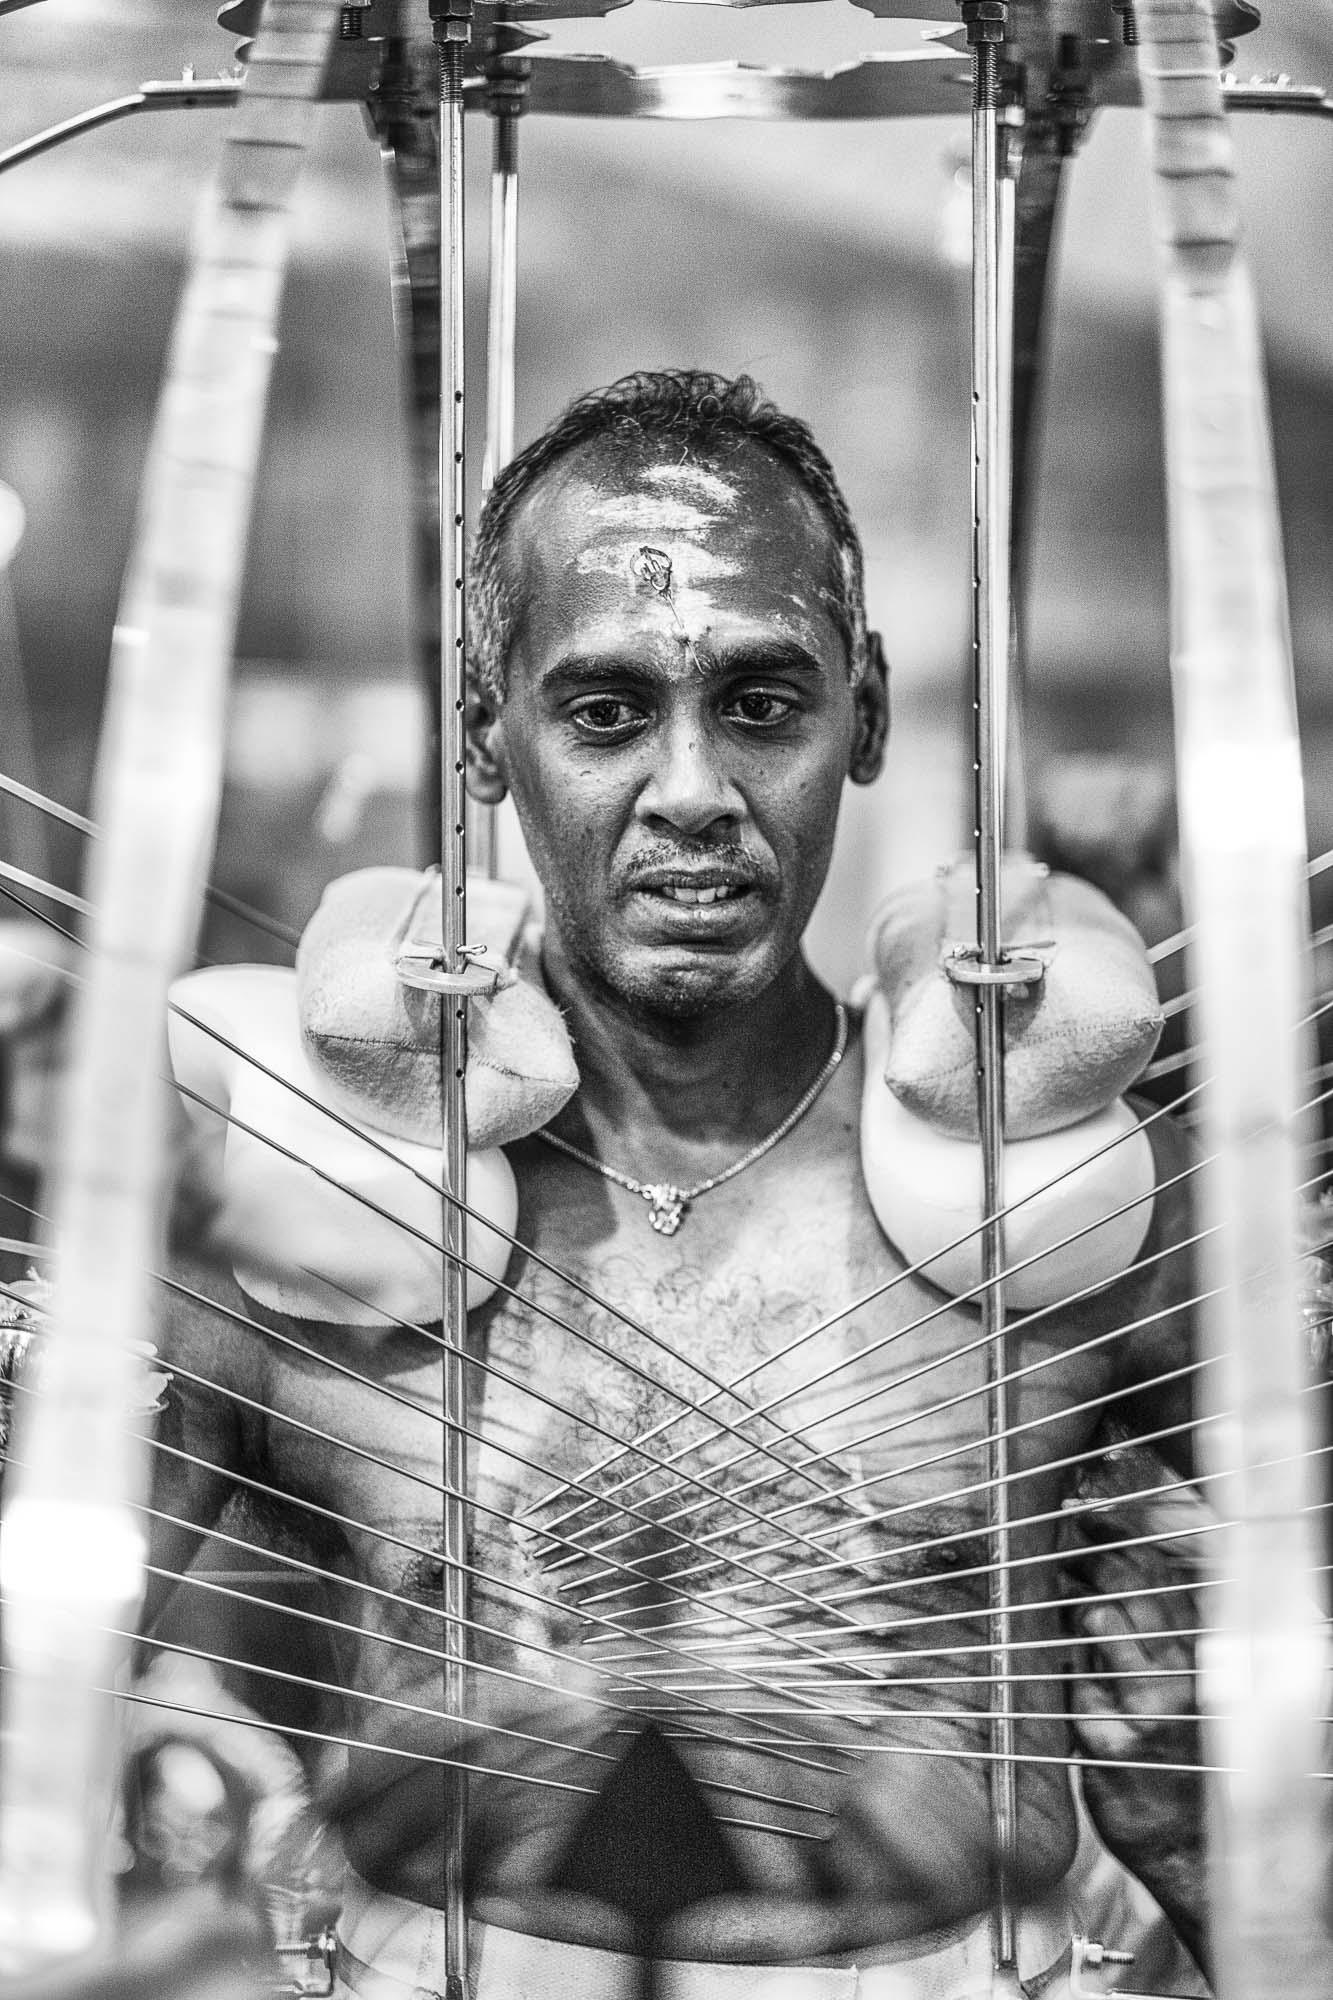 piercing body iron temple Little India Thaipusam Festival hindu Singapore photography jose jeuland documentary event